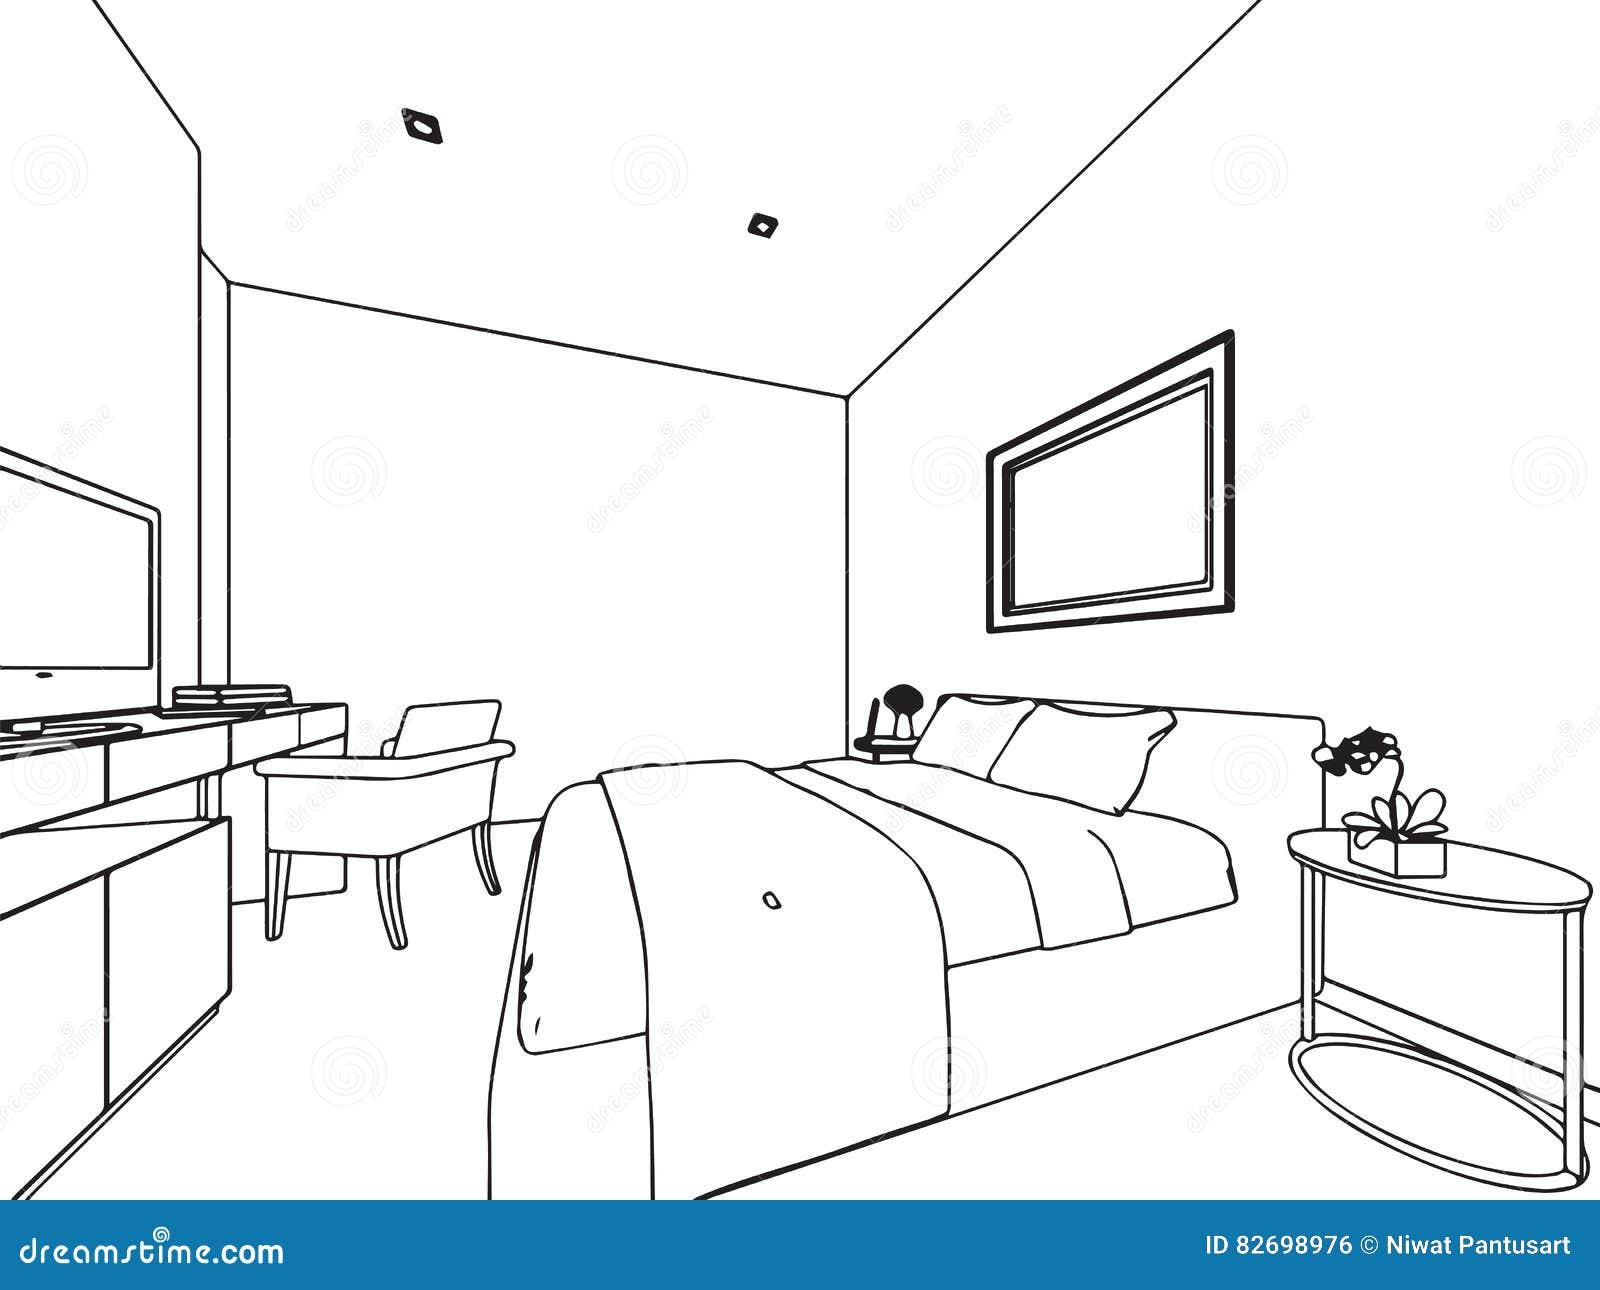 Perspectiva Interior Del Dibujo De Bosquejo Del Esquema De La Casa